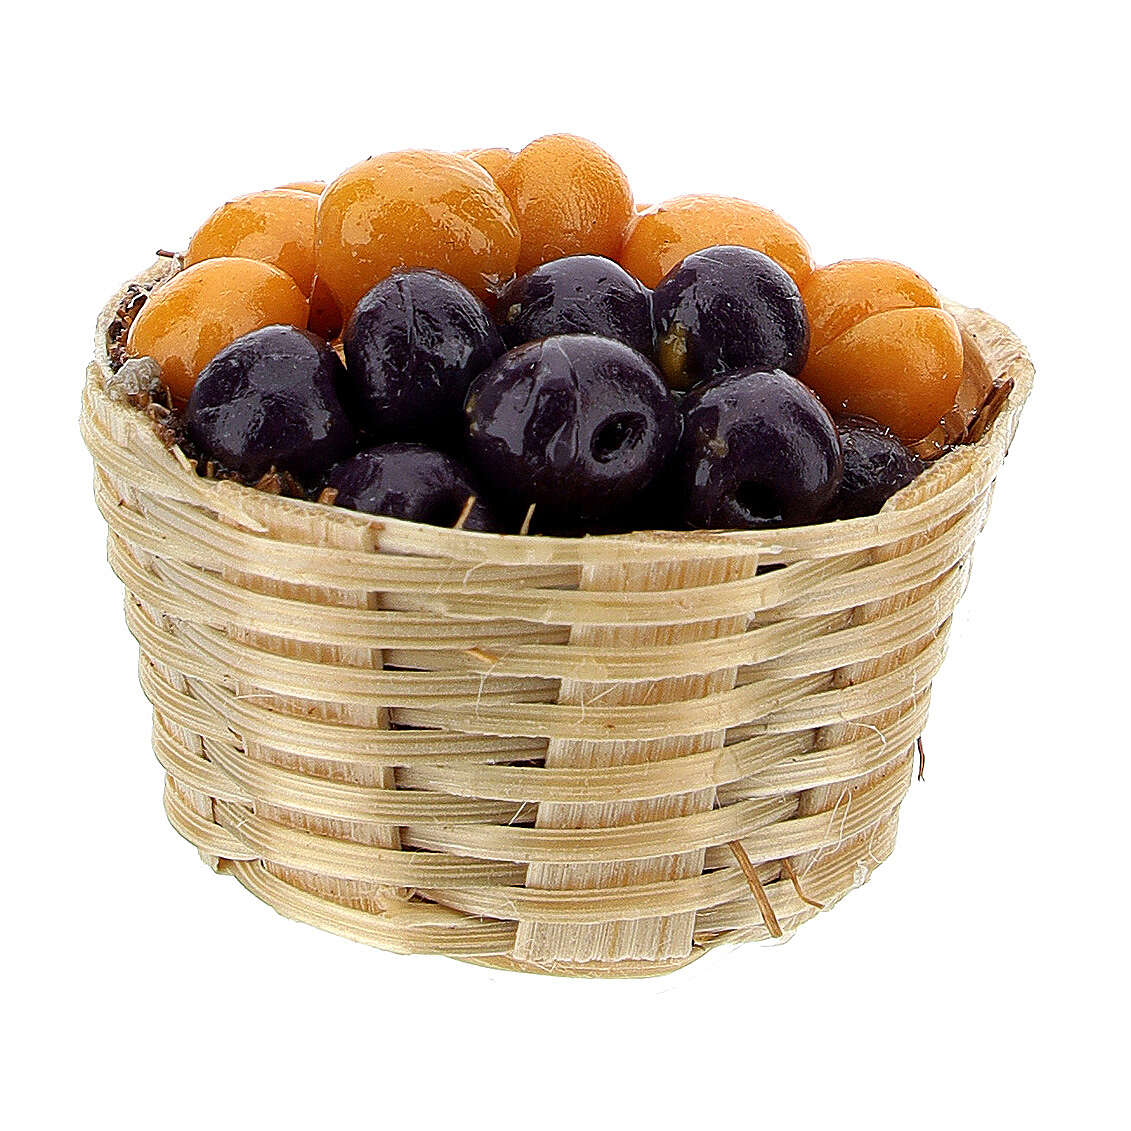 Plums and apricots basket Nativity scene 6 cm 4